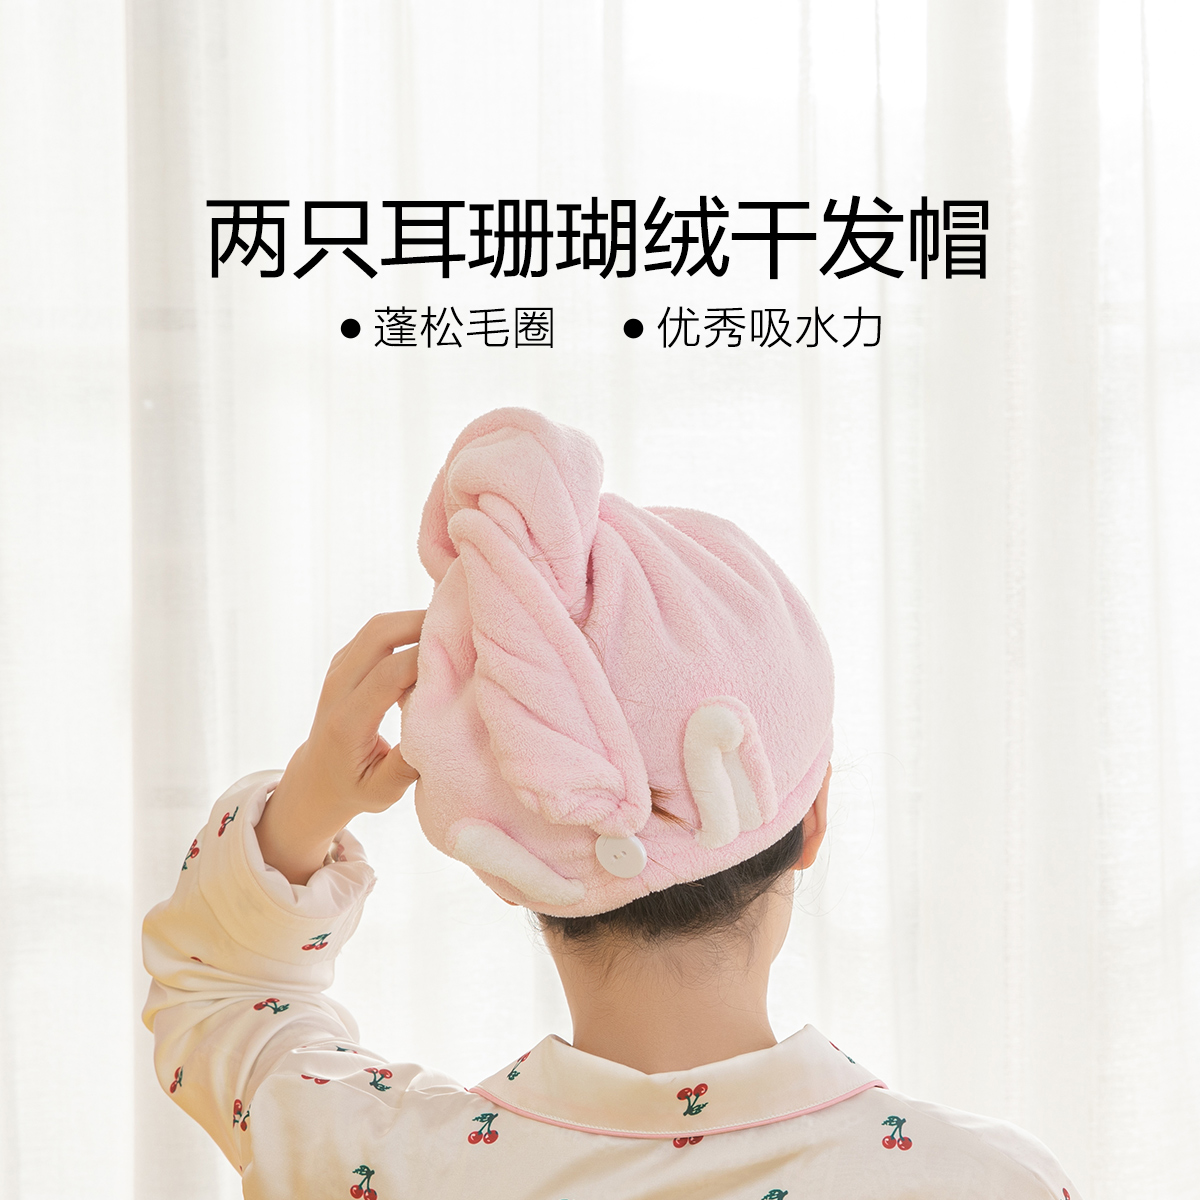 【UPSTAR专属】77 水星家纺两只耳珊瑚绒干发帽